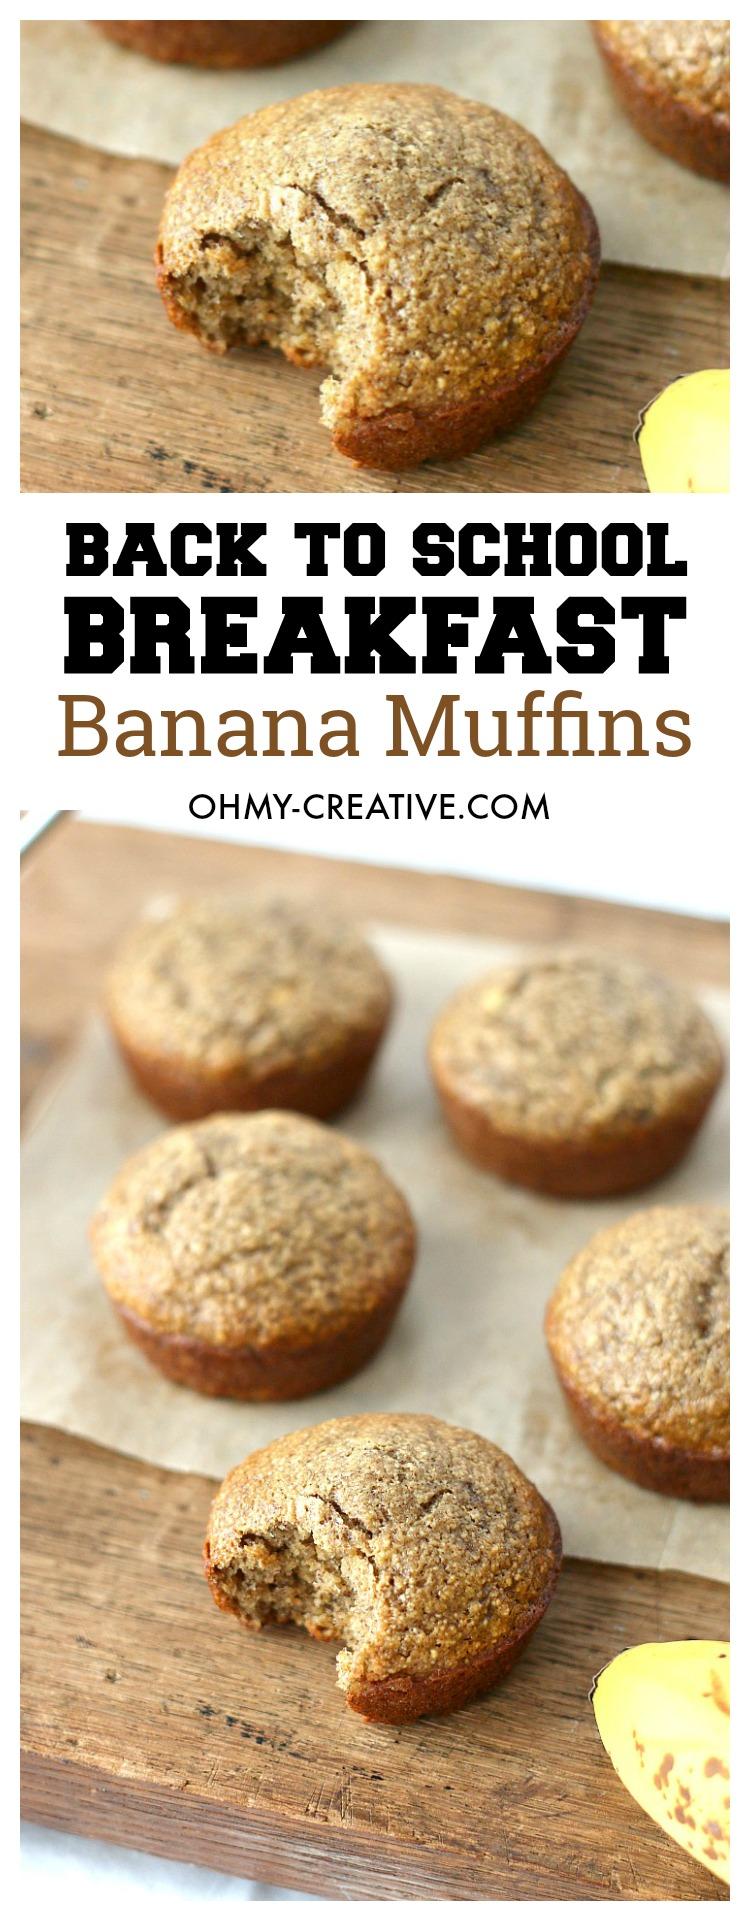 Banana Muffin Recipe   OHMY-CREATIVE.COM   Banana Muffins   Healthy Banana Muffins   Banana Muffins Recipe   Easy Banana Muffins   Breakfast Muffins   Breakfast ideas for Kids   Banana Muffins healthy   Back to school breakfast ideas